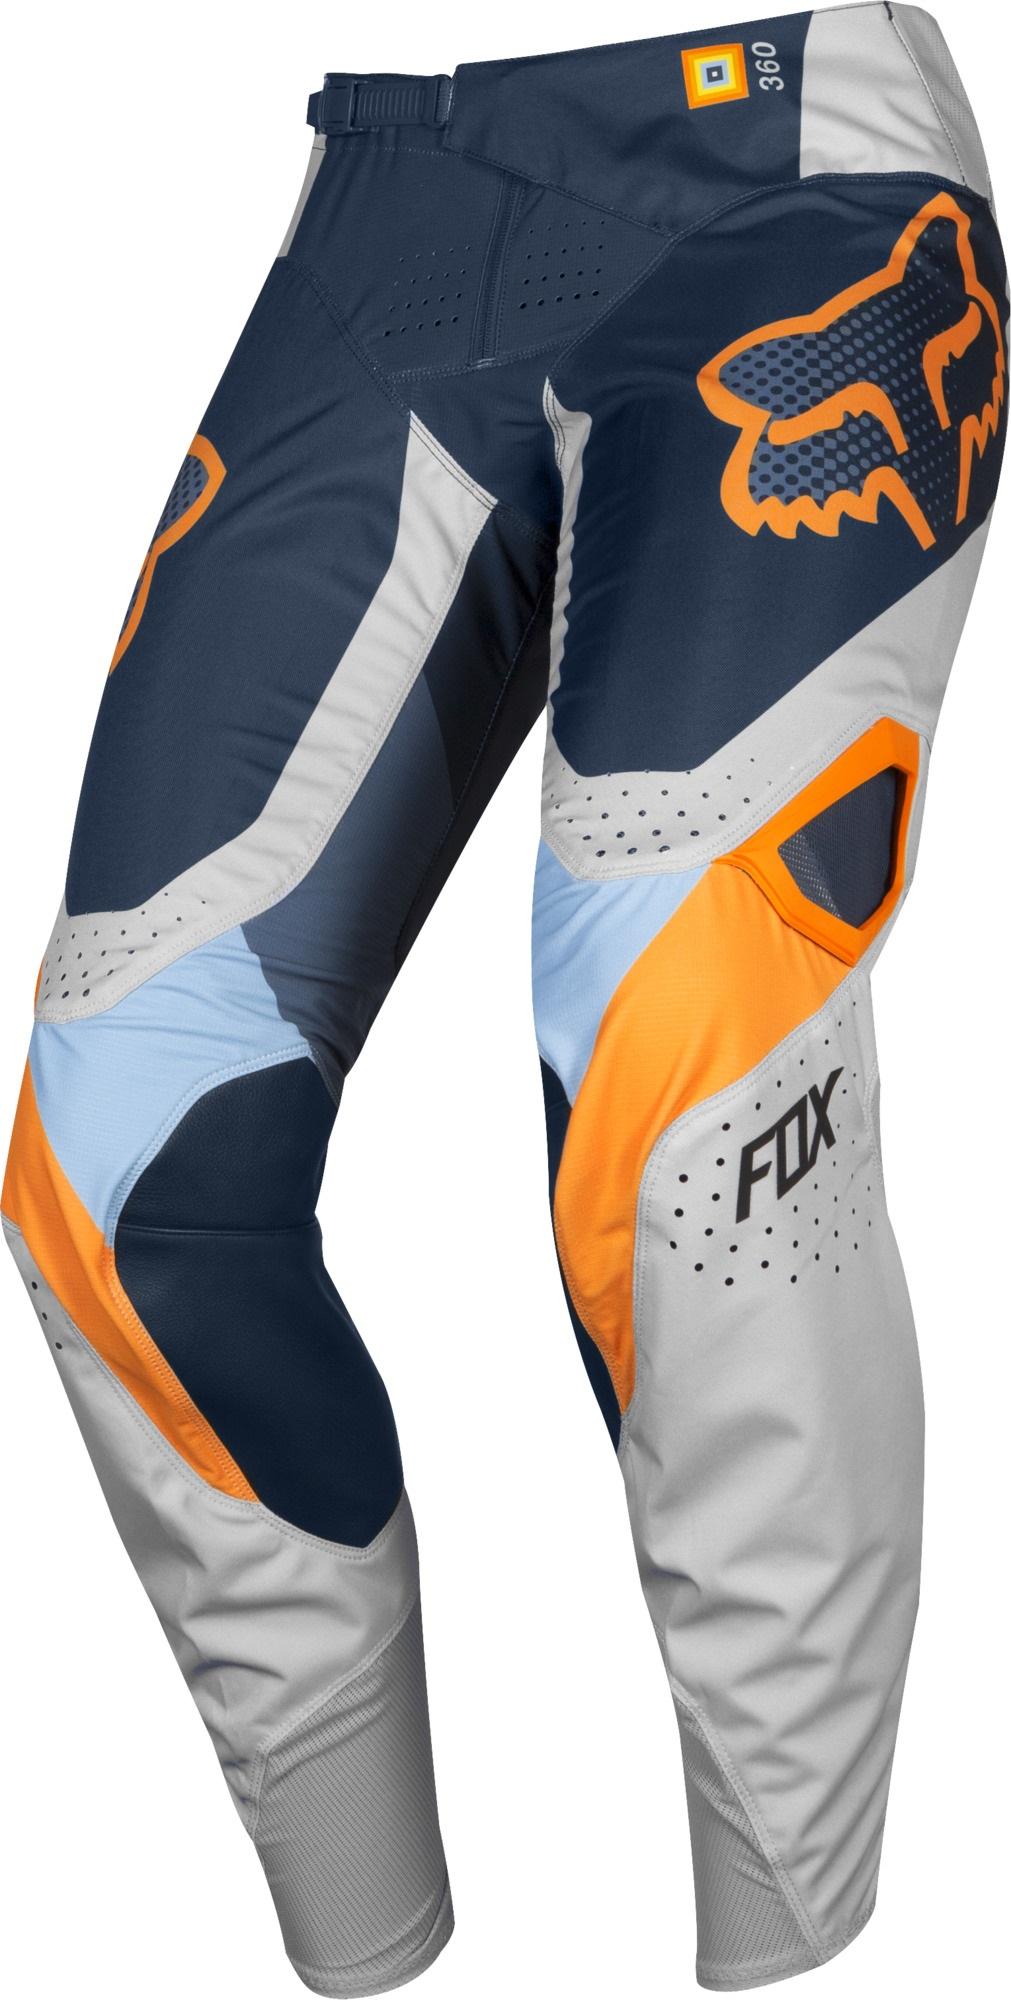 FOX 360 Murc Pant, Light Grey MX19